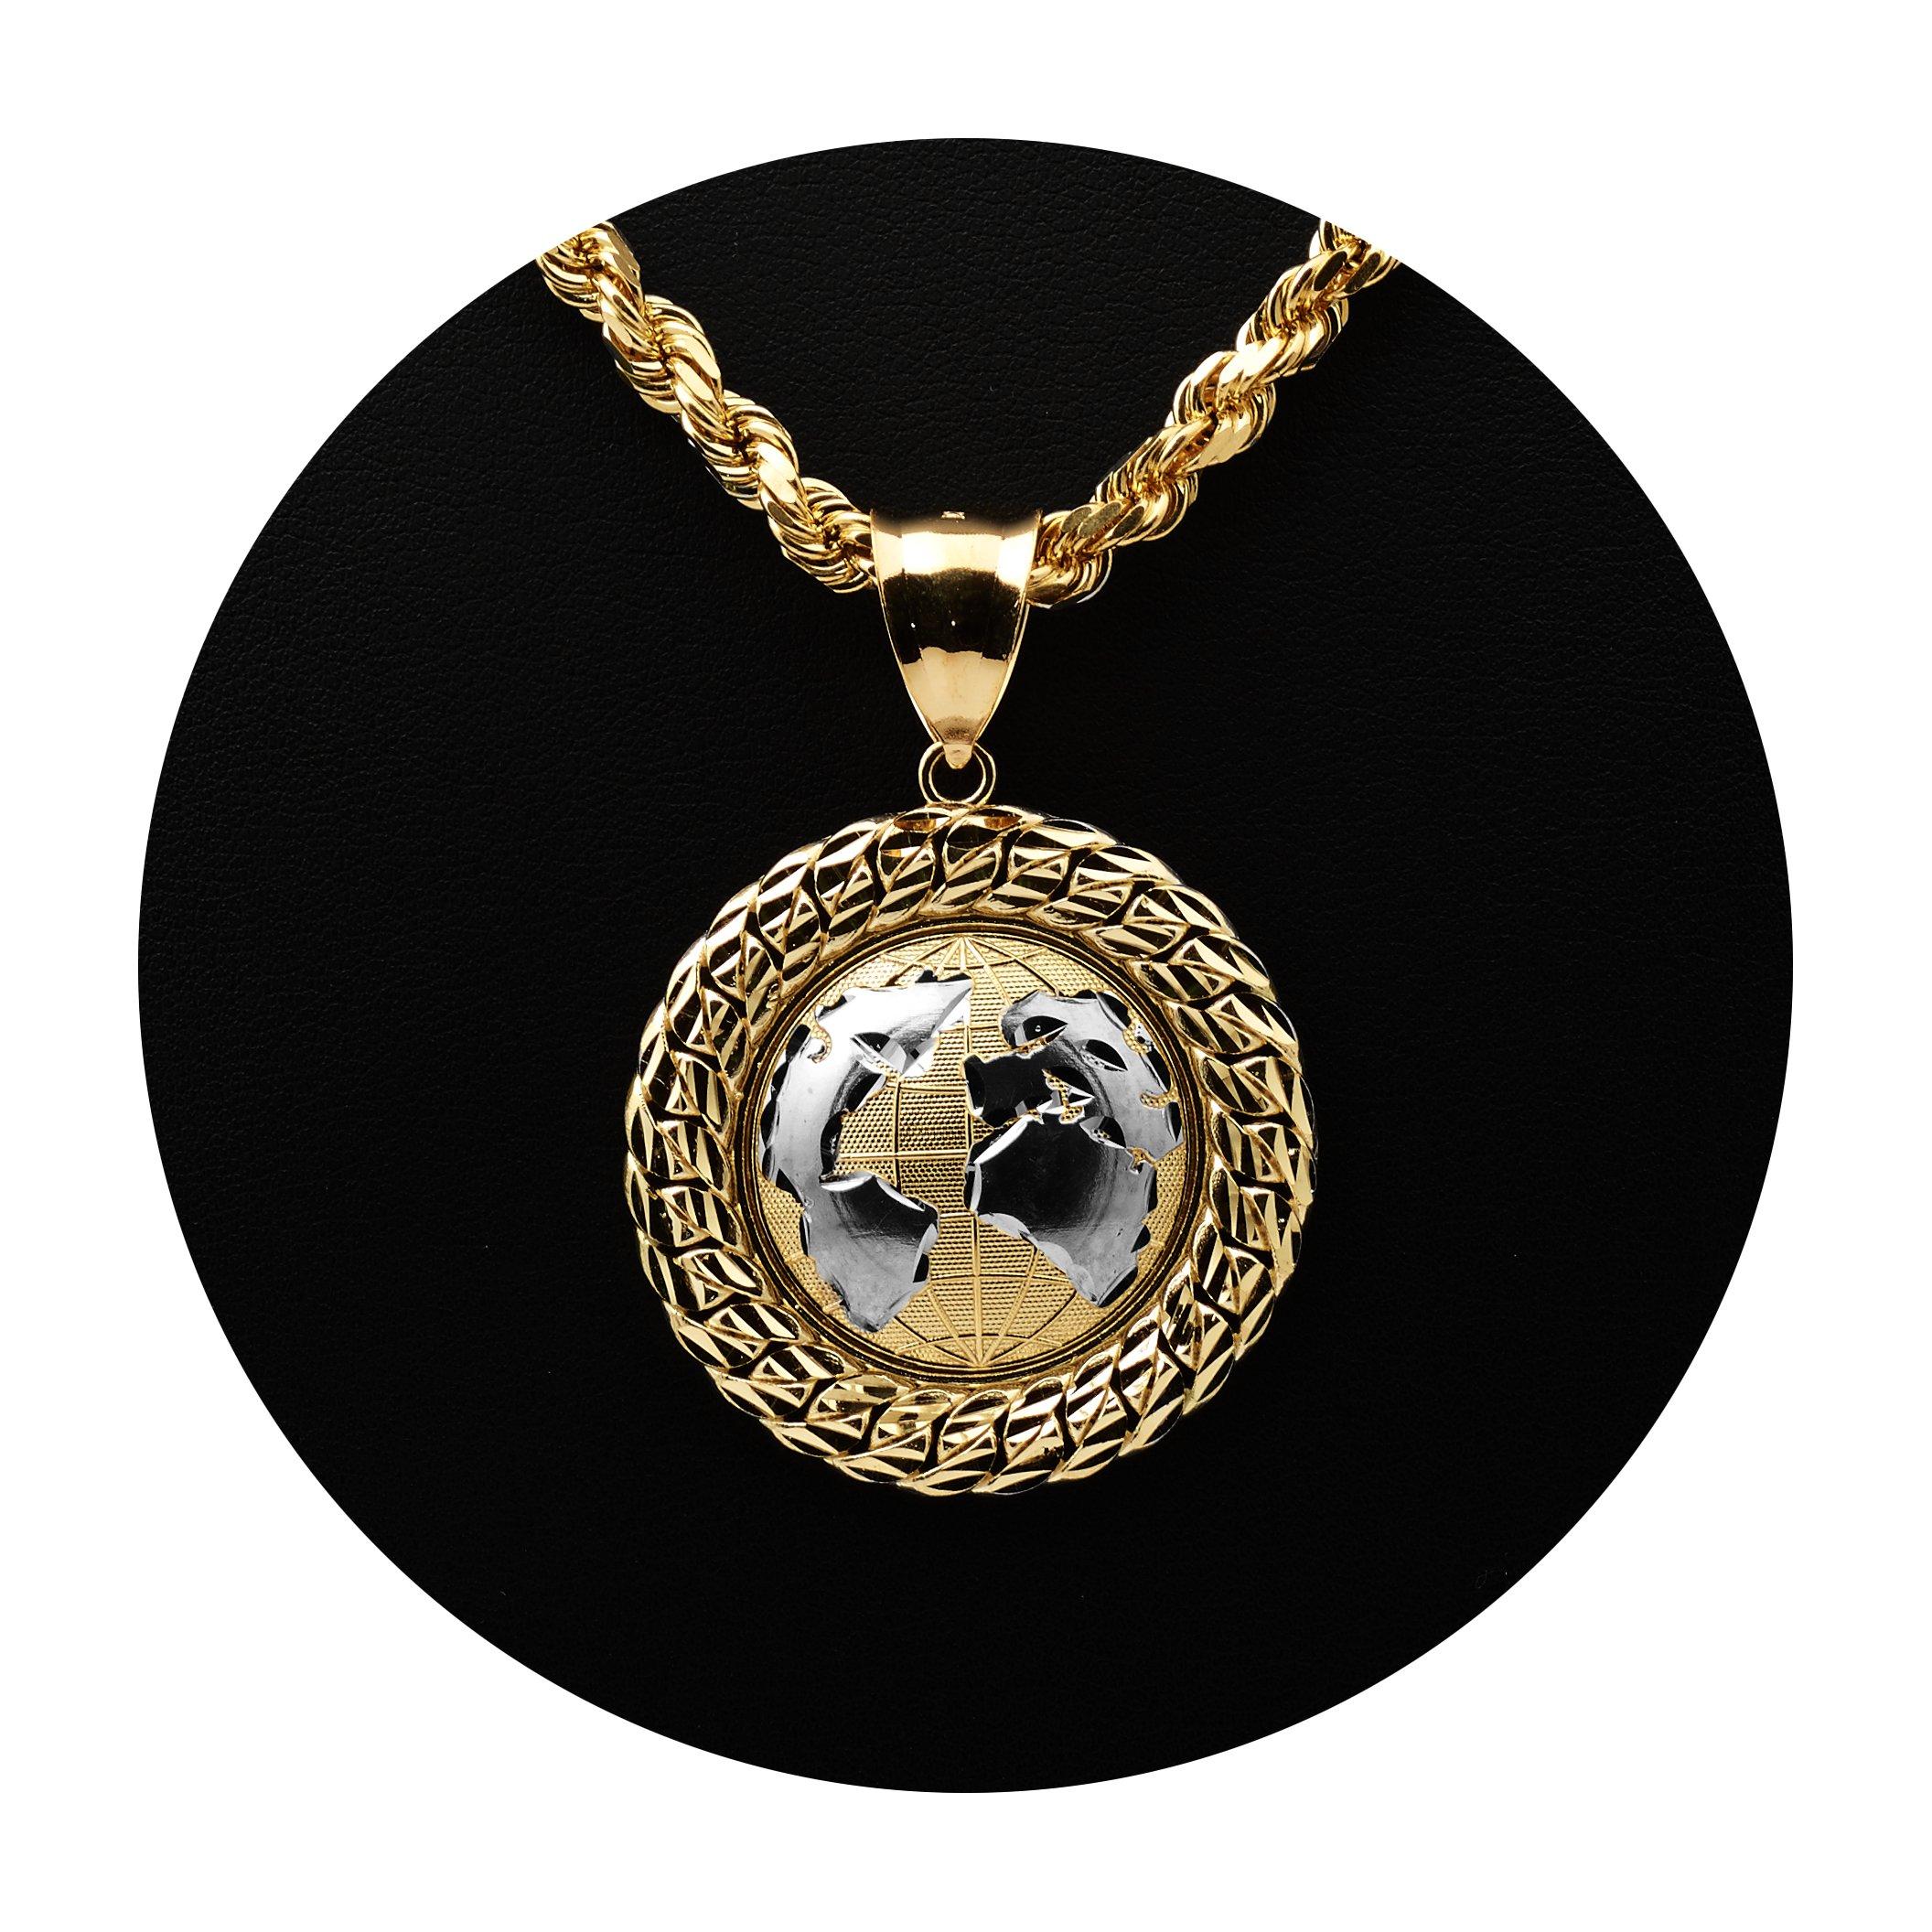 MR. BLING10K Yellow Gold Two-Tone World Map Globe Charm Pendant w/ Cuban Link Border (1.87'' x 1.34'')